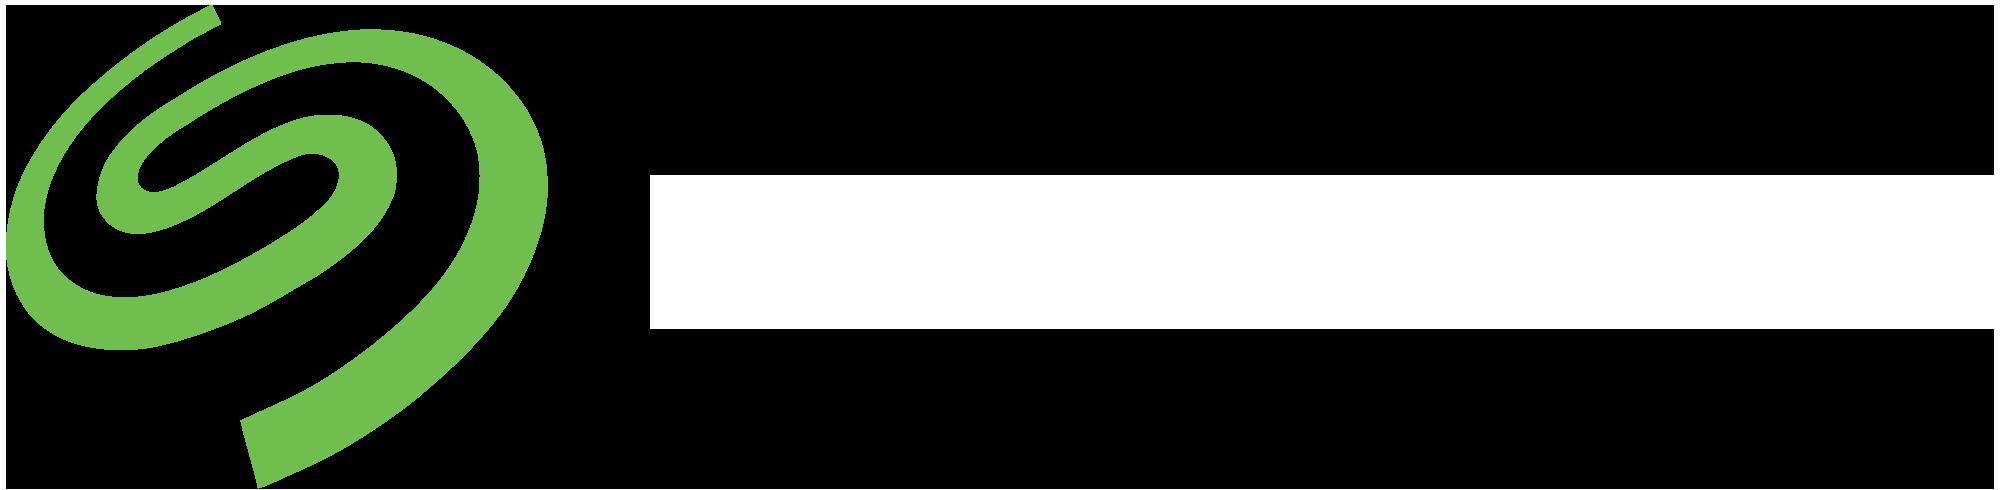 Seagate_logo_white.png